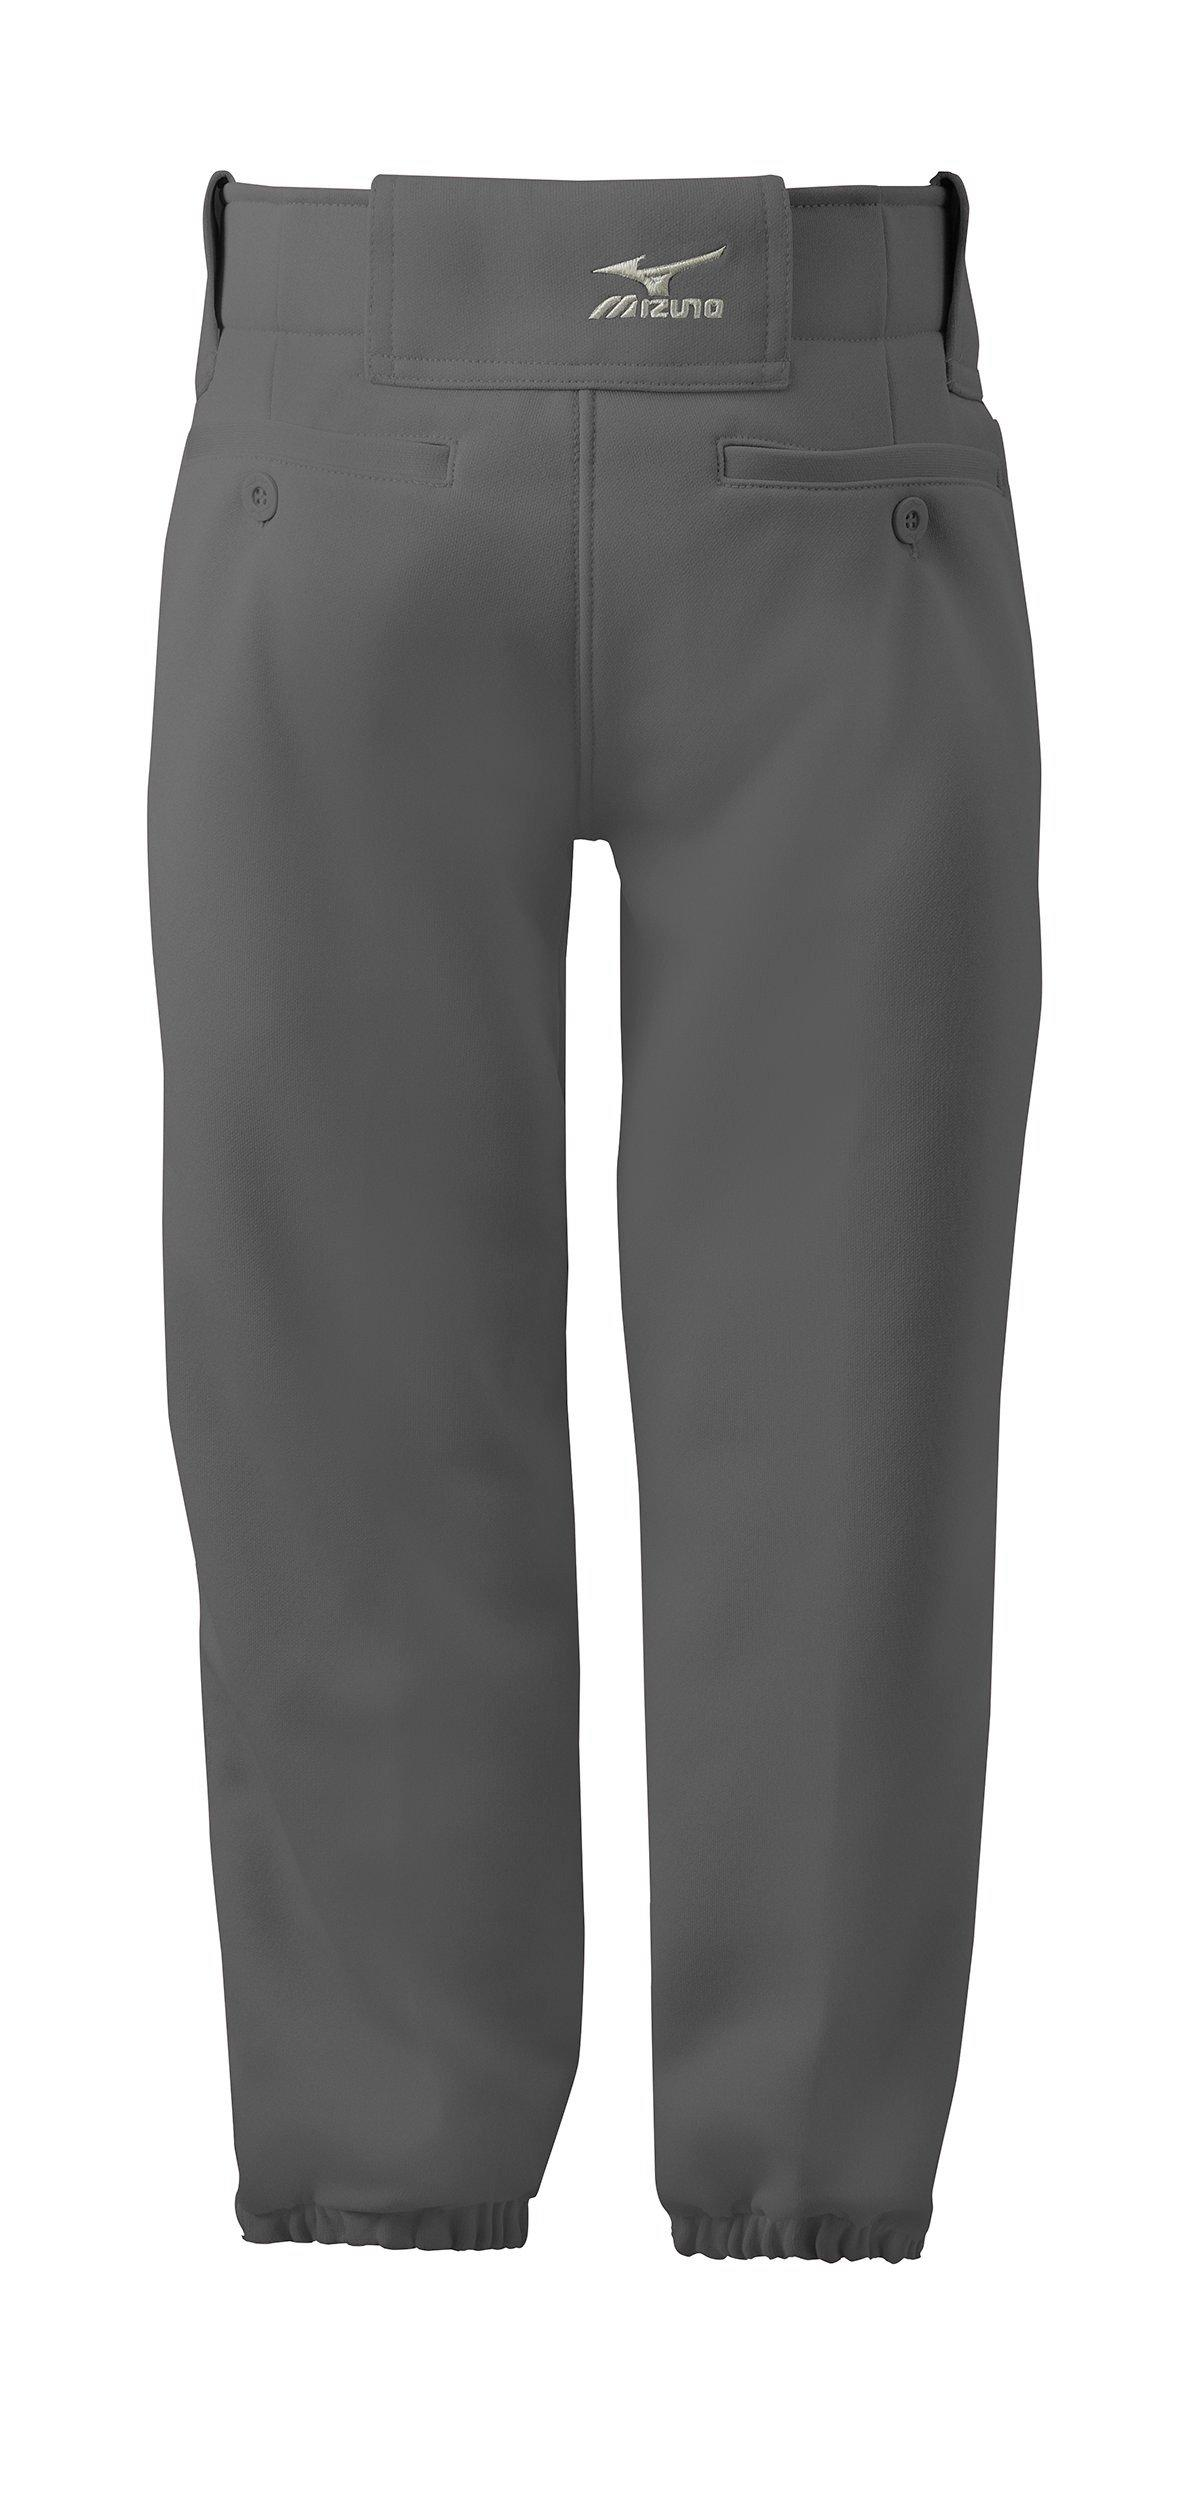 Mizuno Girl/'s Belted Softball Pant